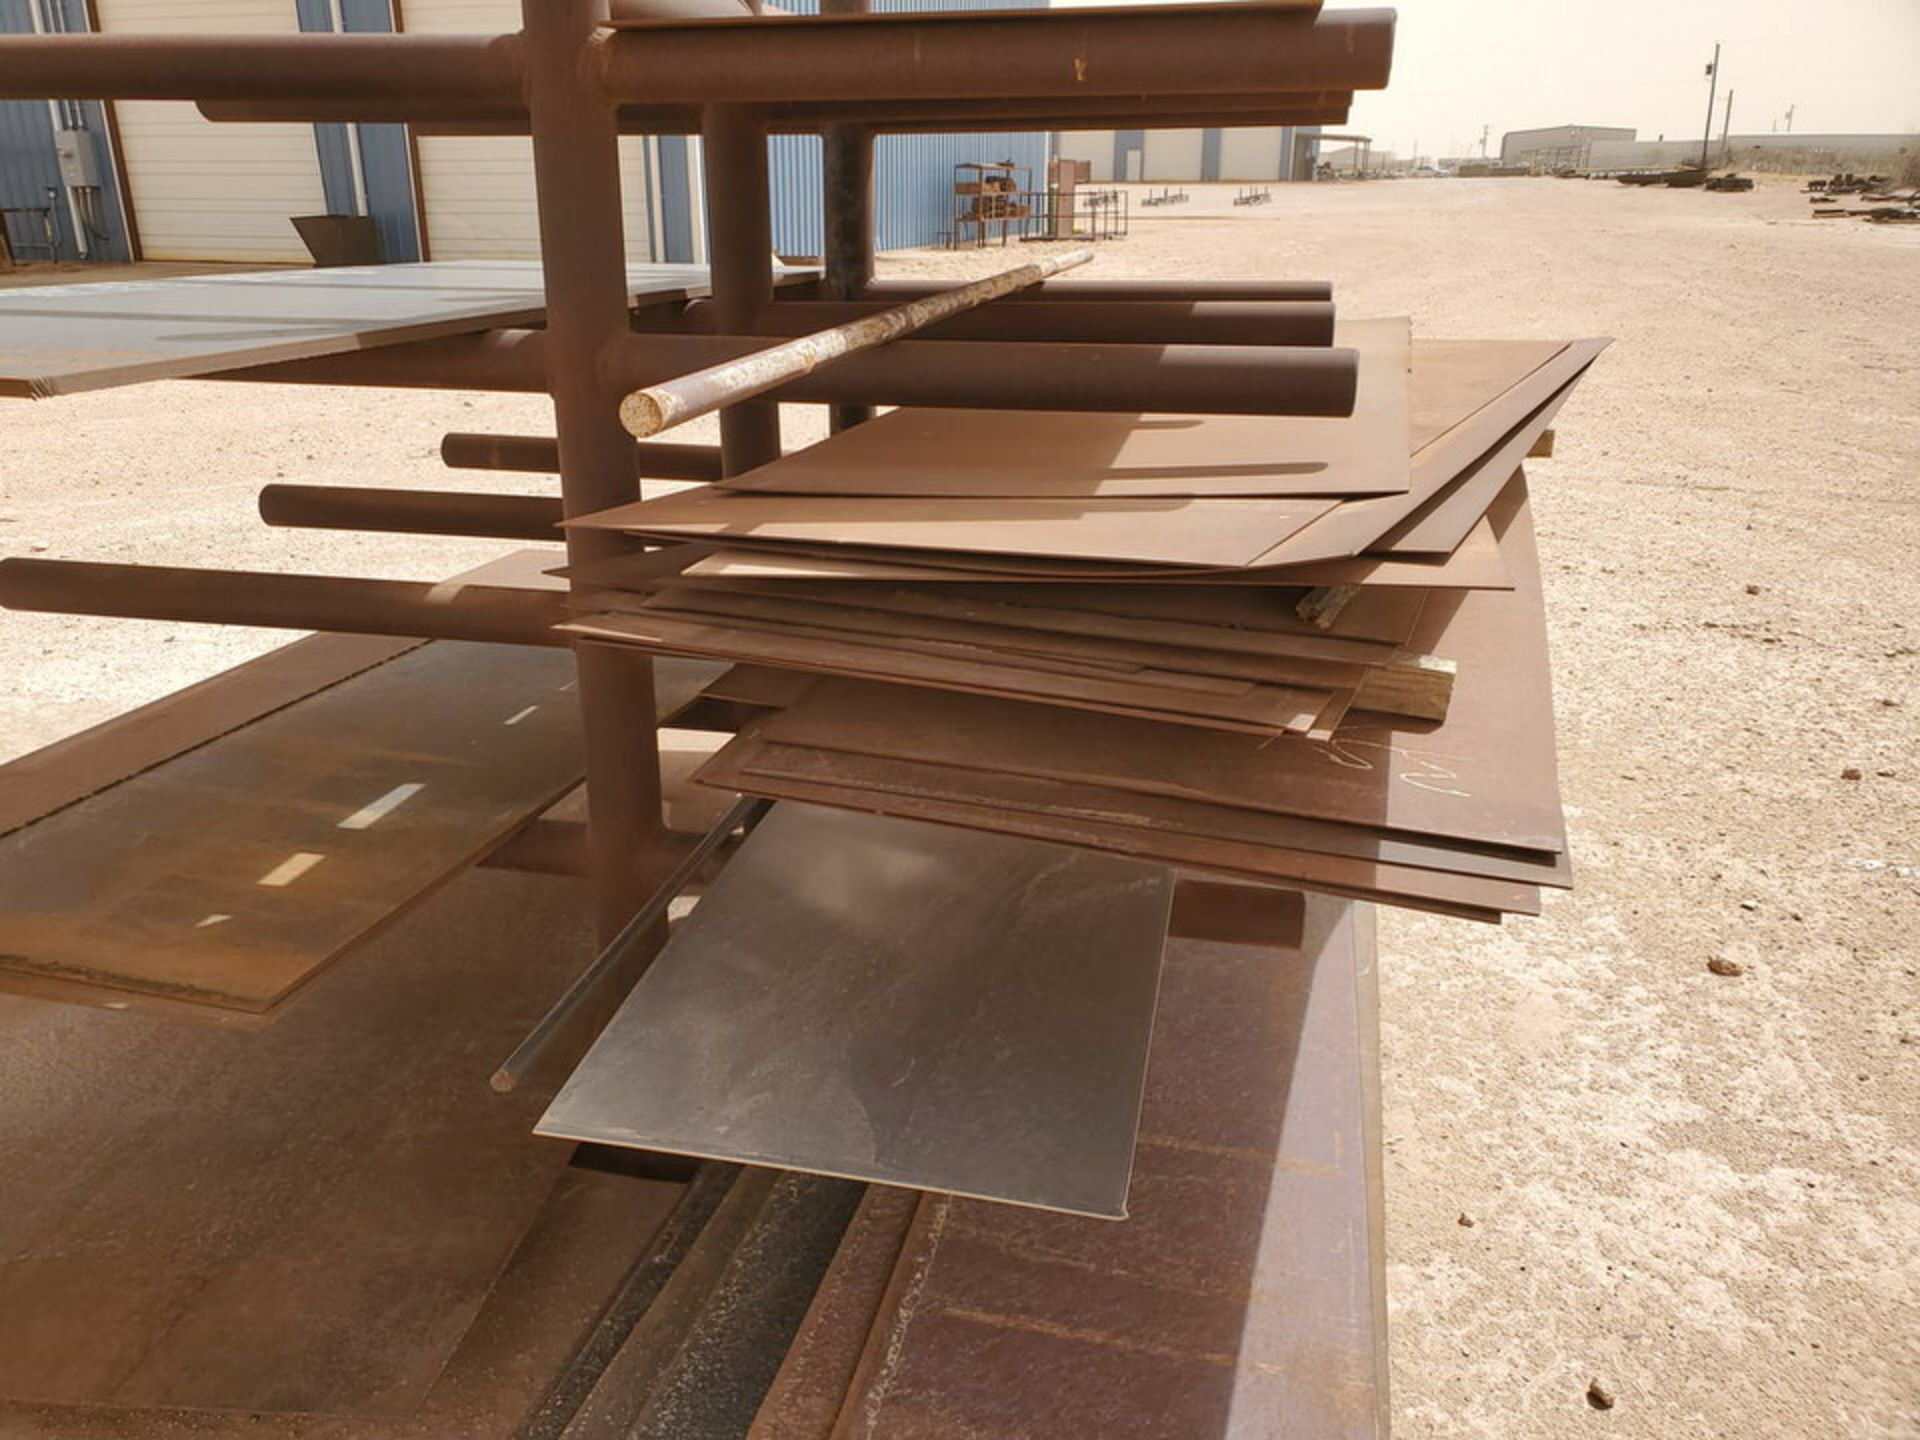 "Flat Bar & Metal Sheets L: 3' - 15', W: 1' - 5'7-1/2"", Thk: 3/16"" - 9/16""; W/ Racks - Image 12 of 12"